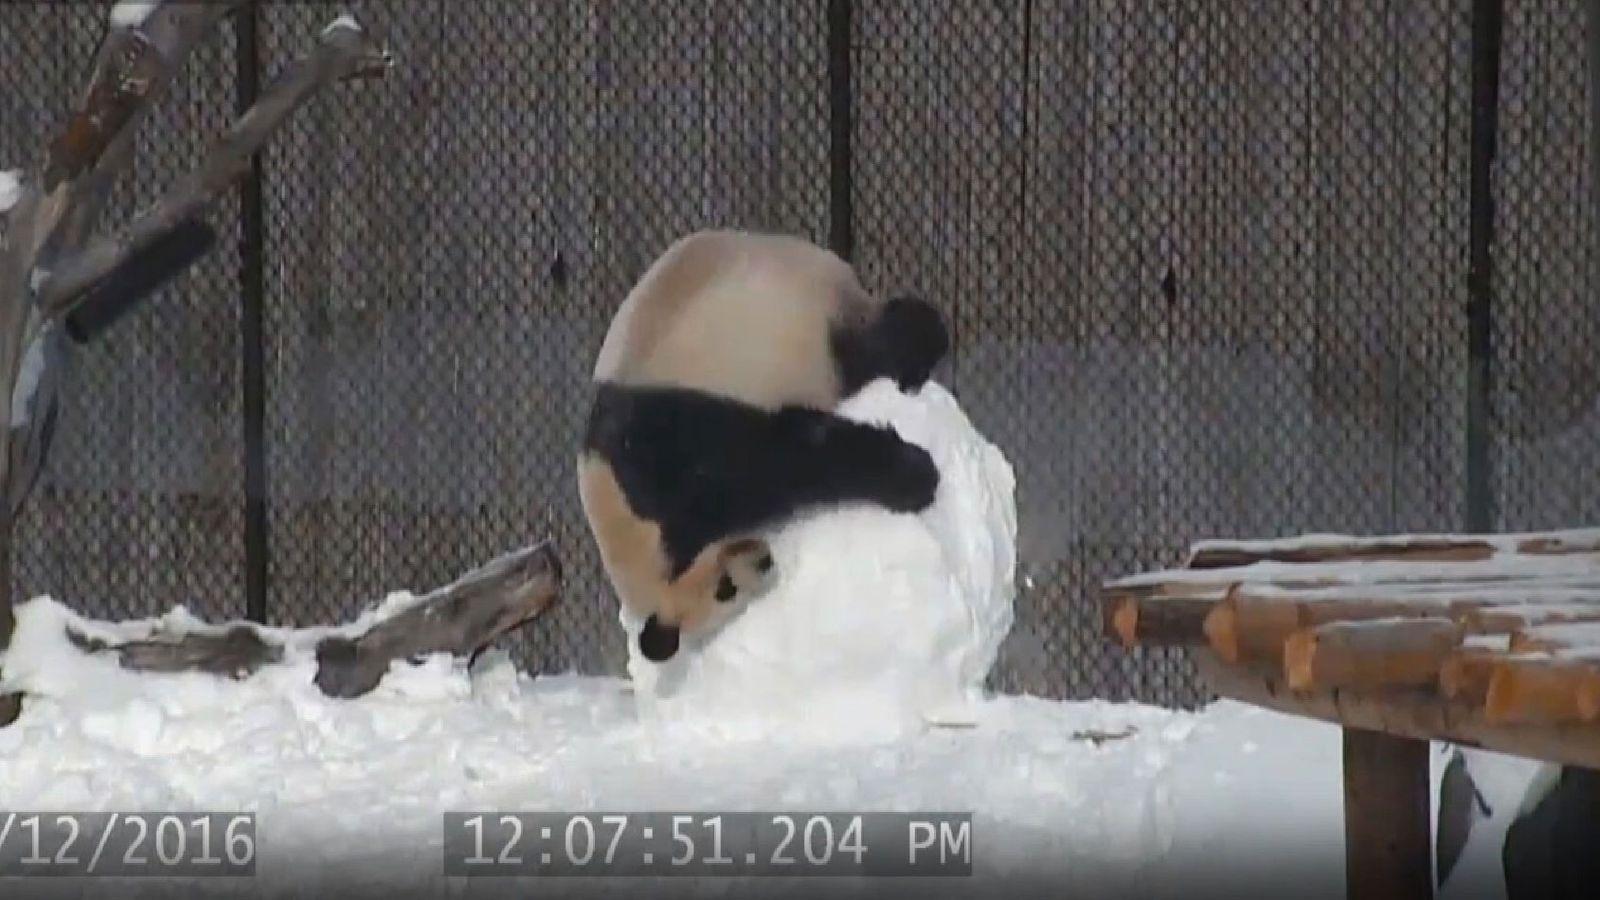 Panda wrestles with snowman. Pic: Toronto Zoo